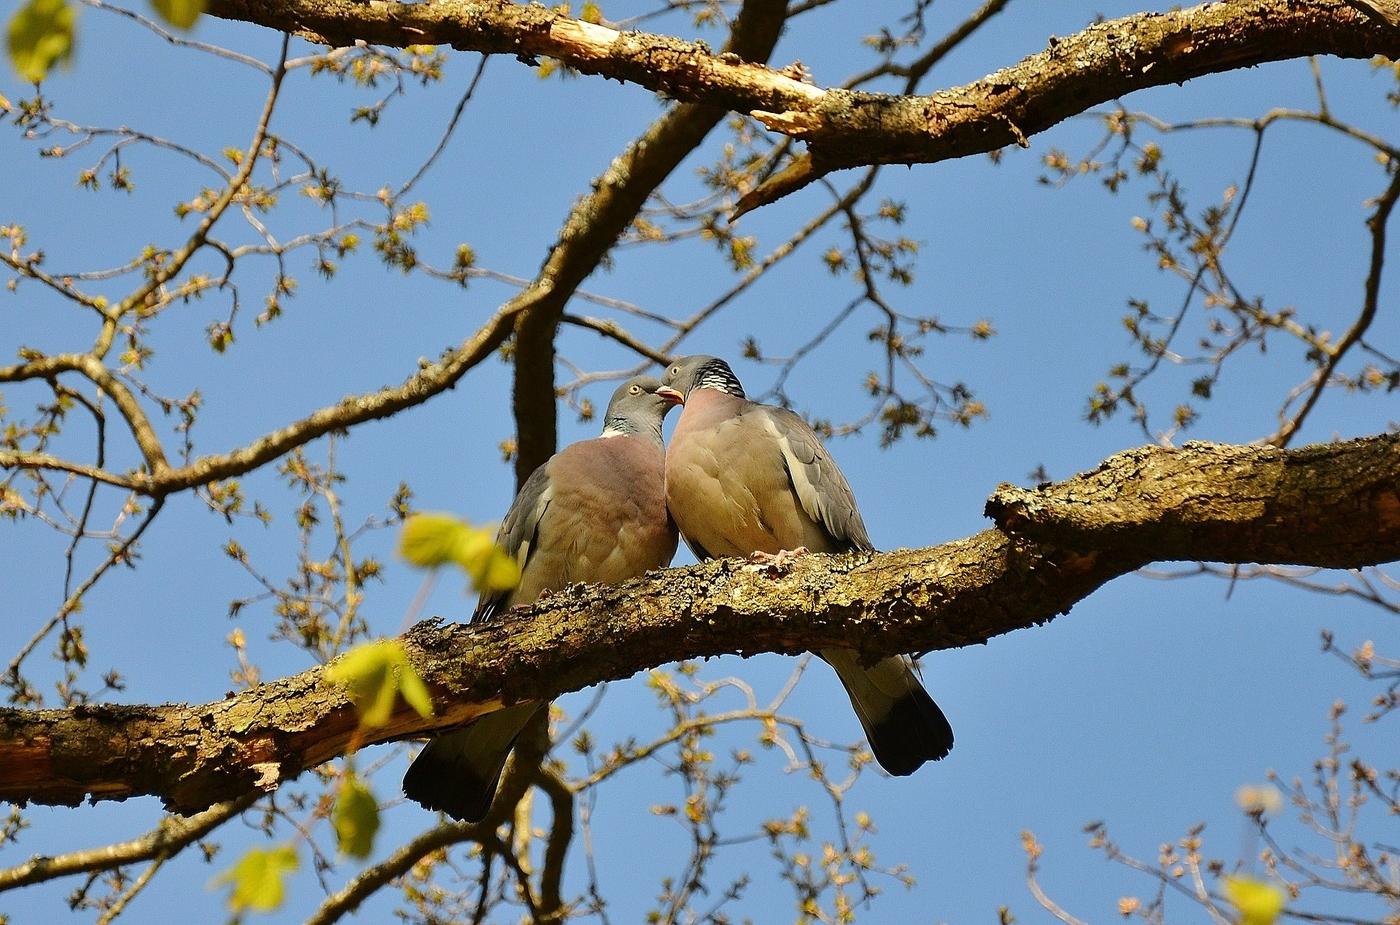 pigeons-50005_1920.jpg